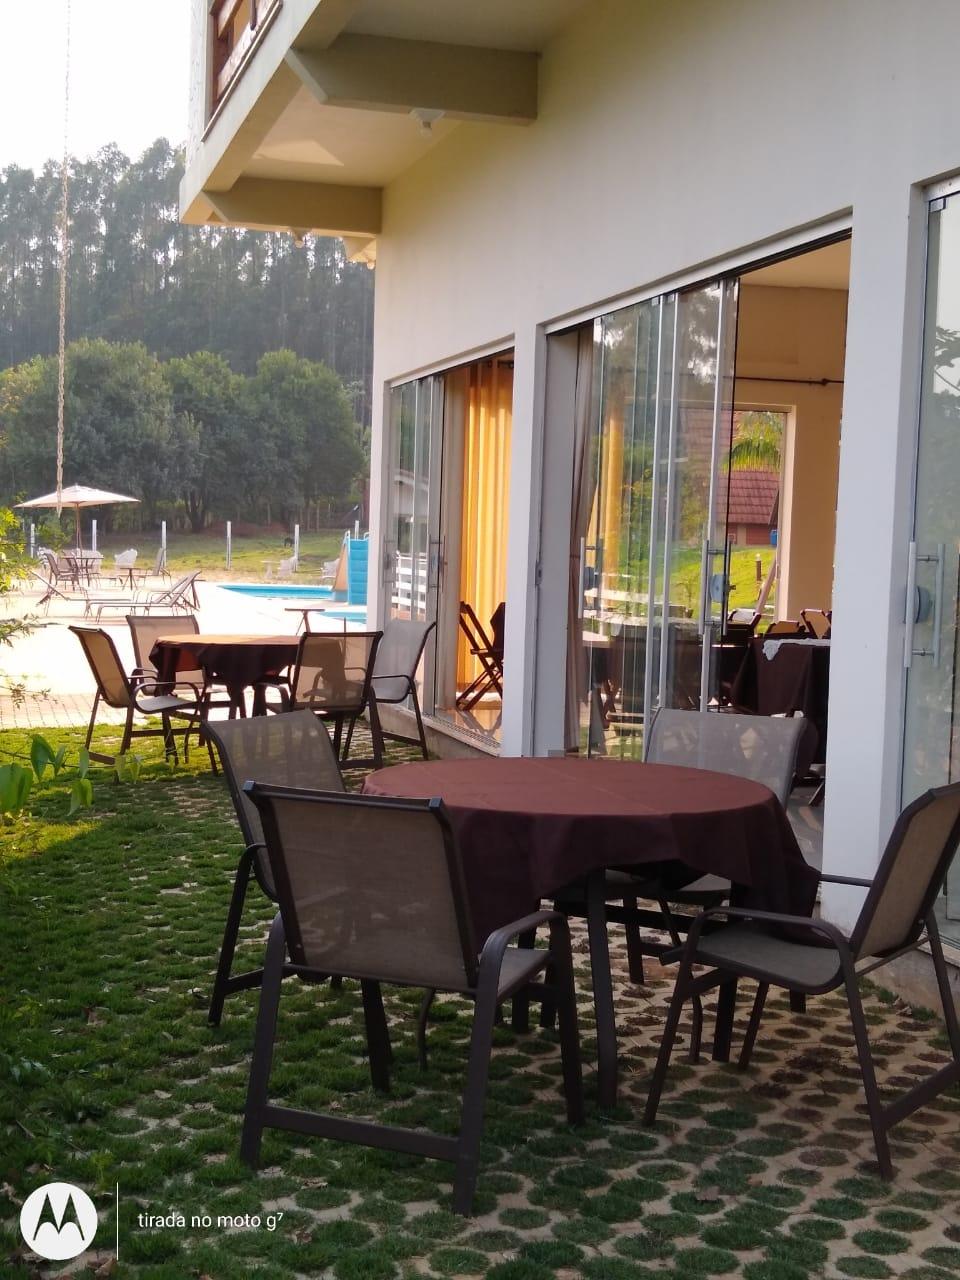 marlei-marleiturismo-bela-vista-terraco-restaurante.jpg